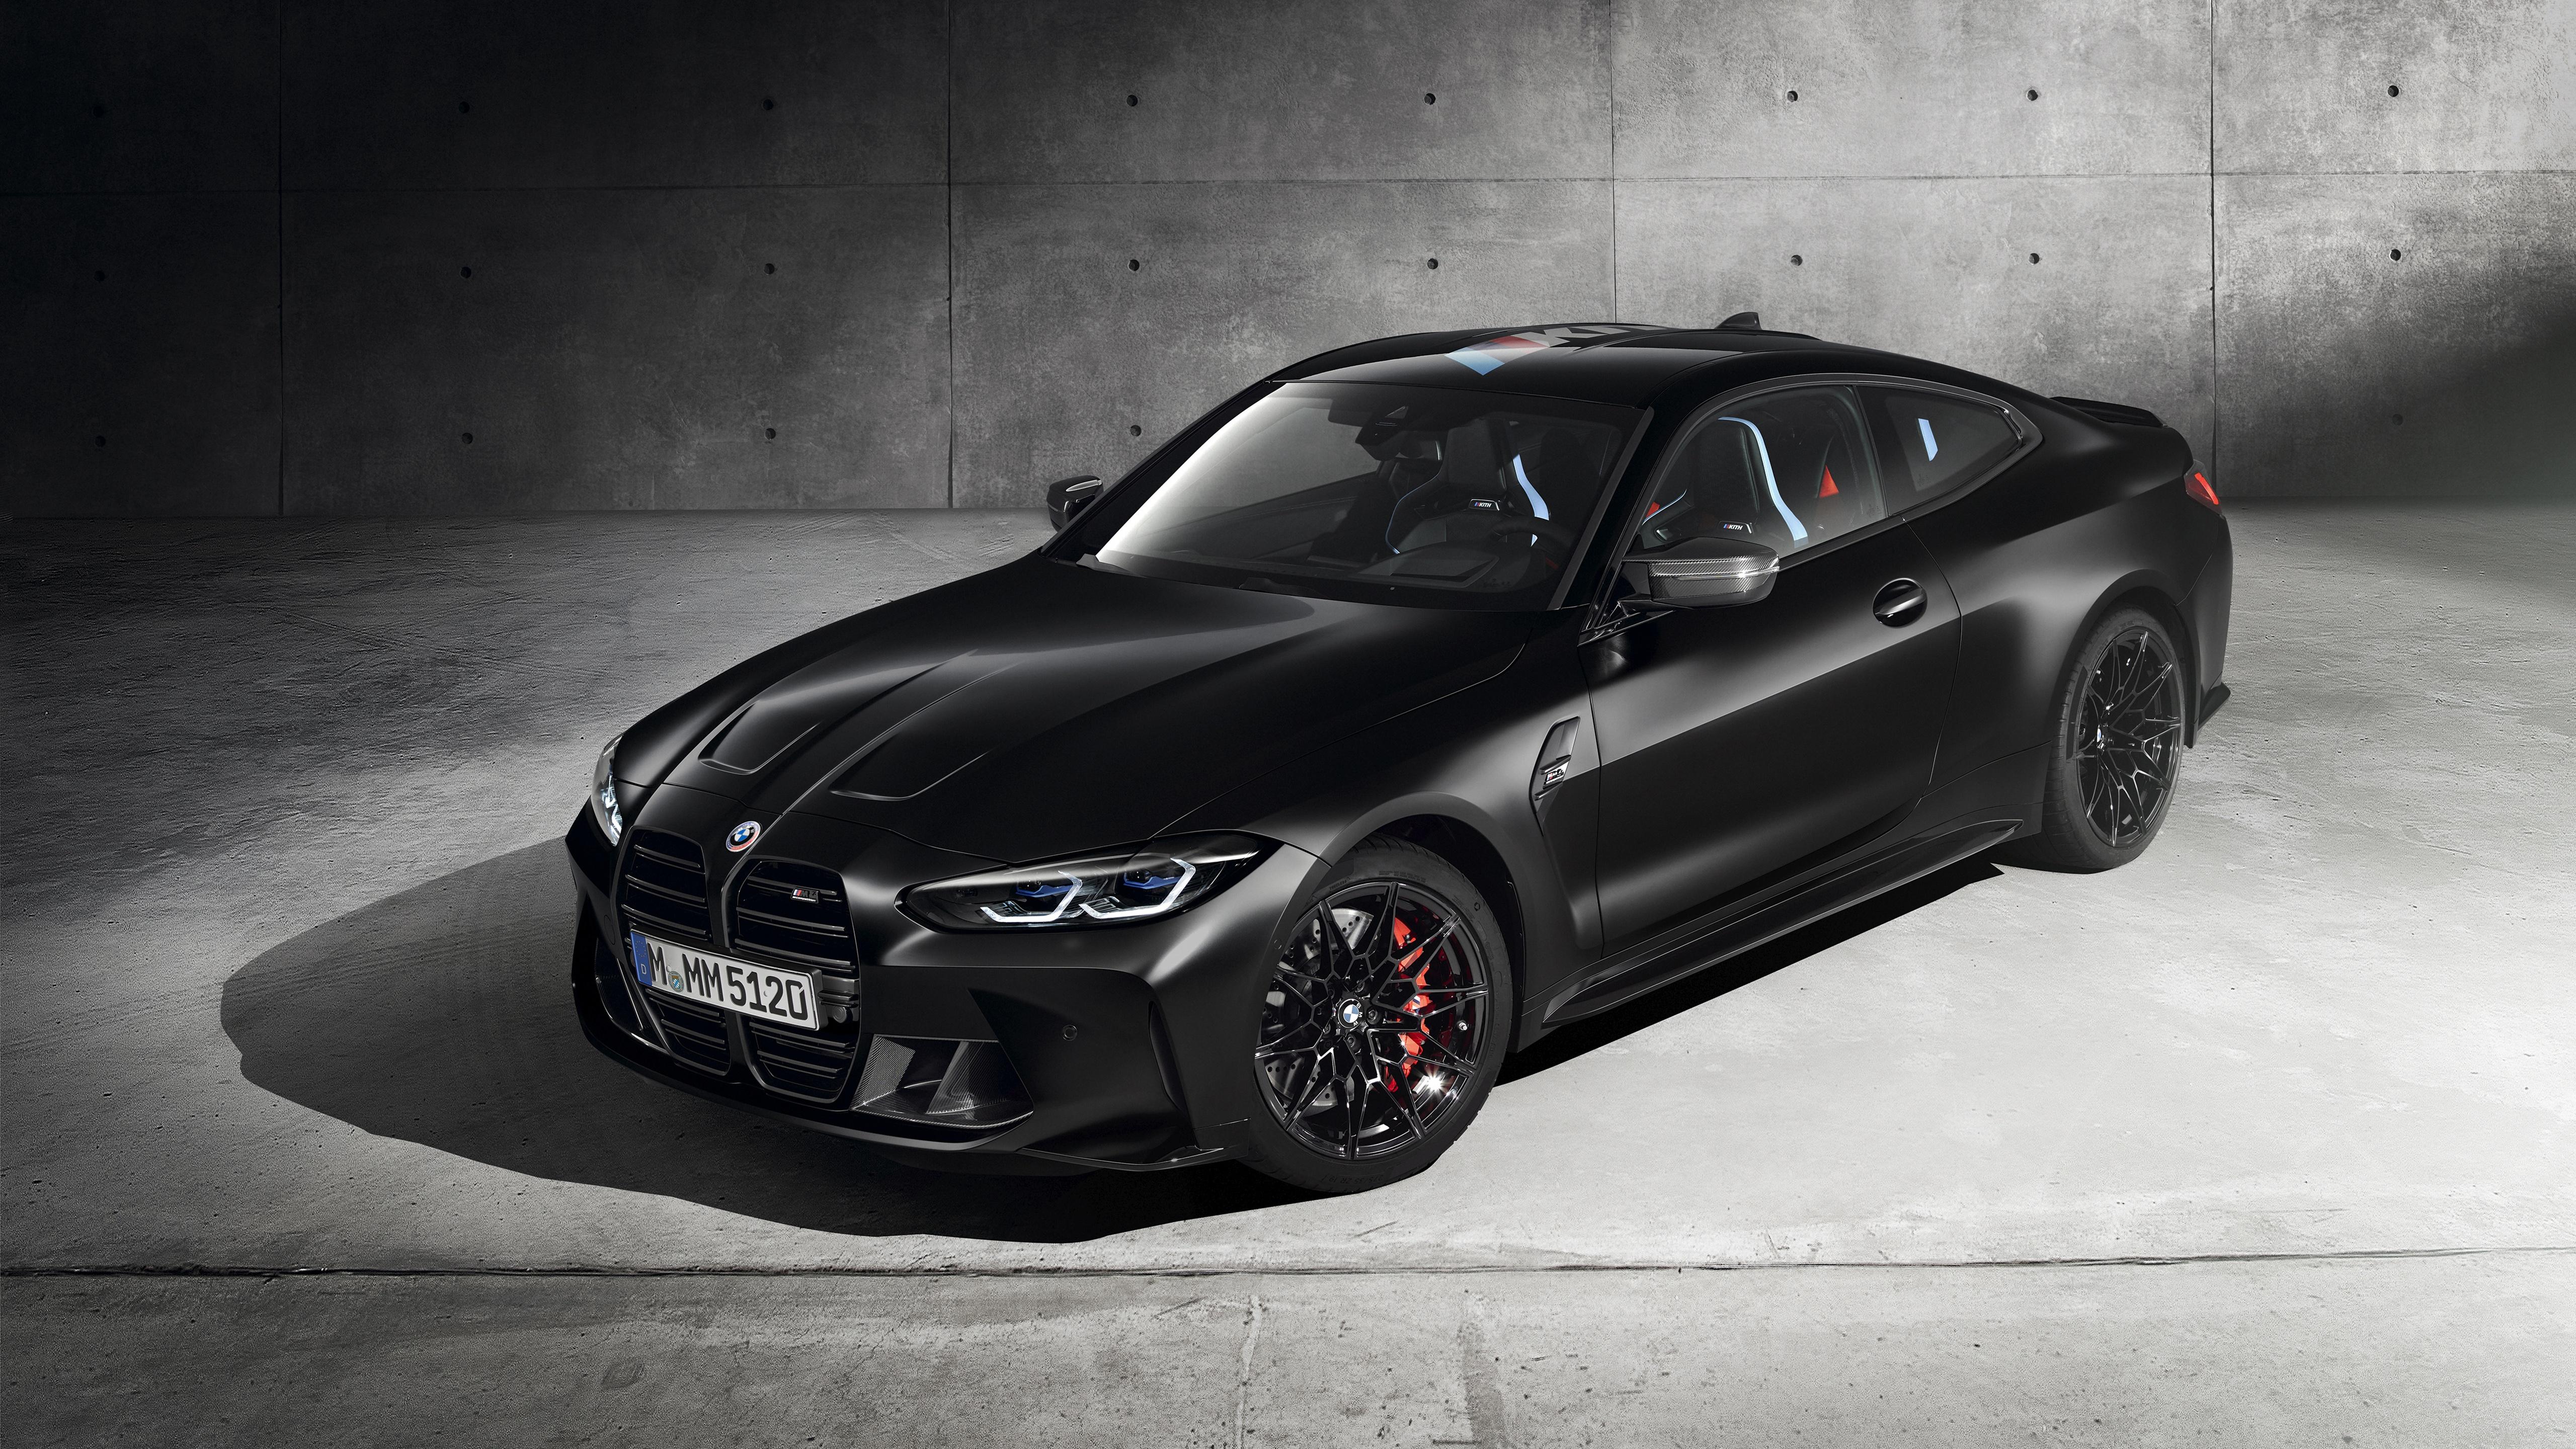 Bmw M4 Competition 4k Wallpaper Black Cars 2020 5k Black Dark 3118